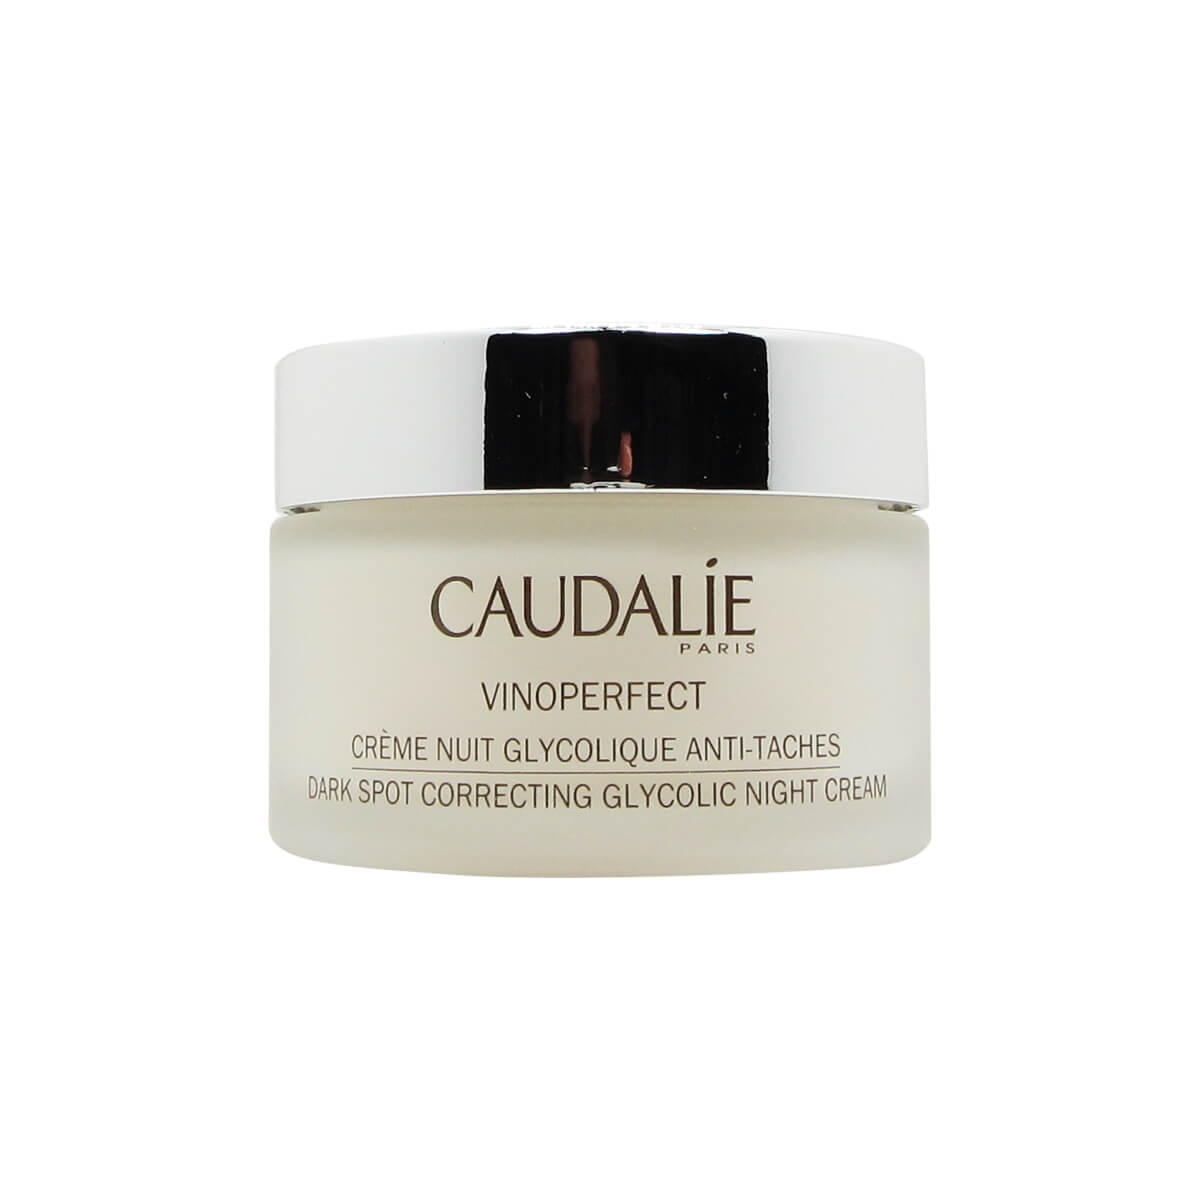 Caudalie - Vinoperfect Creme de Noite Glicólico Anti-Manchas 50ml